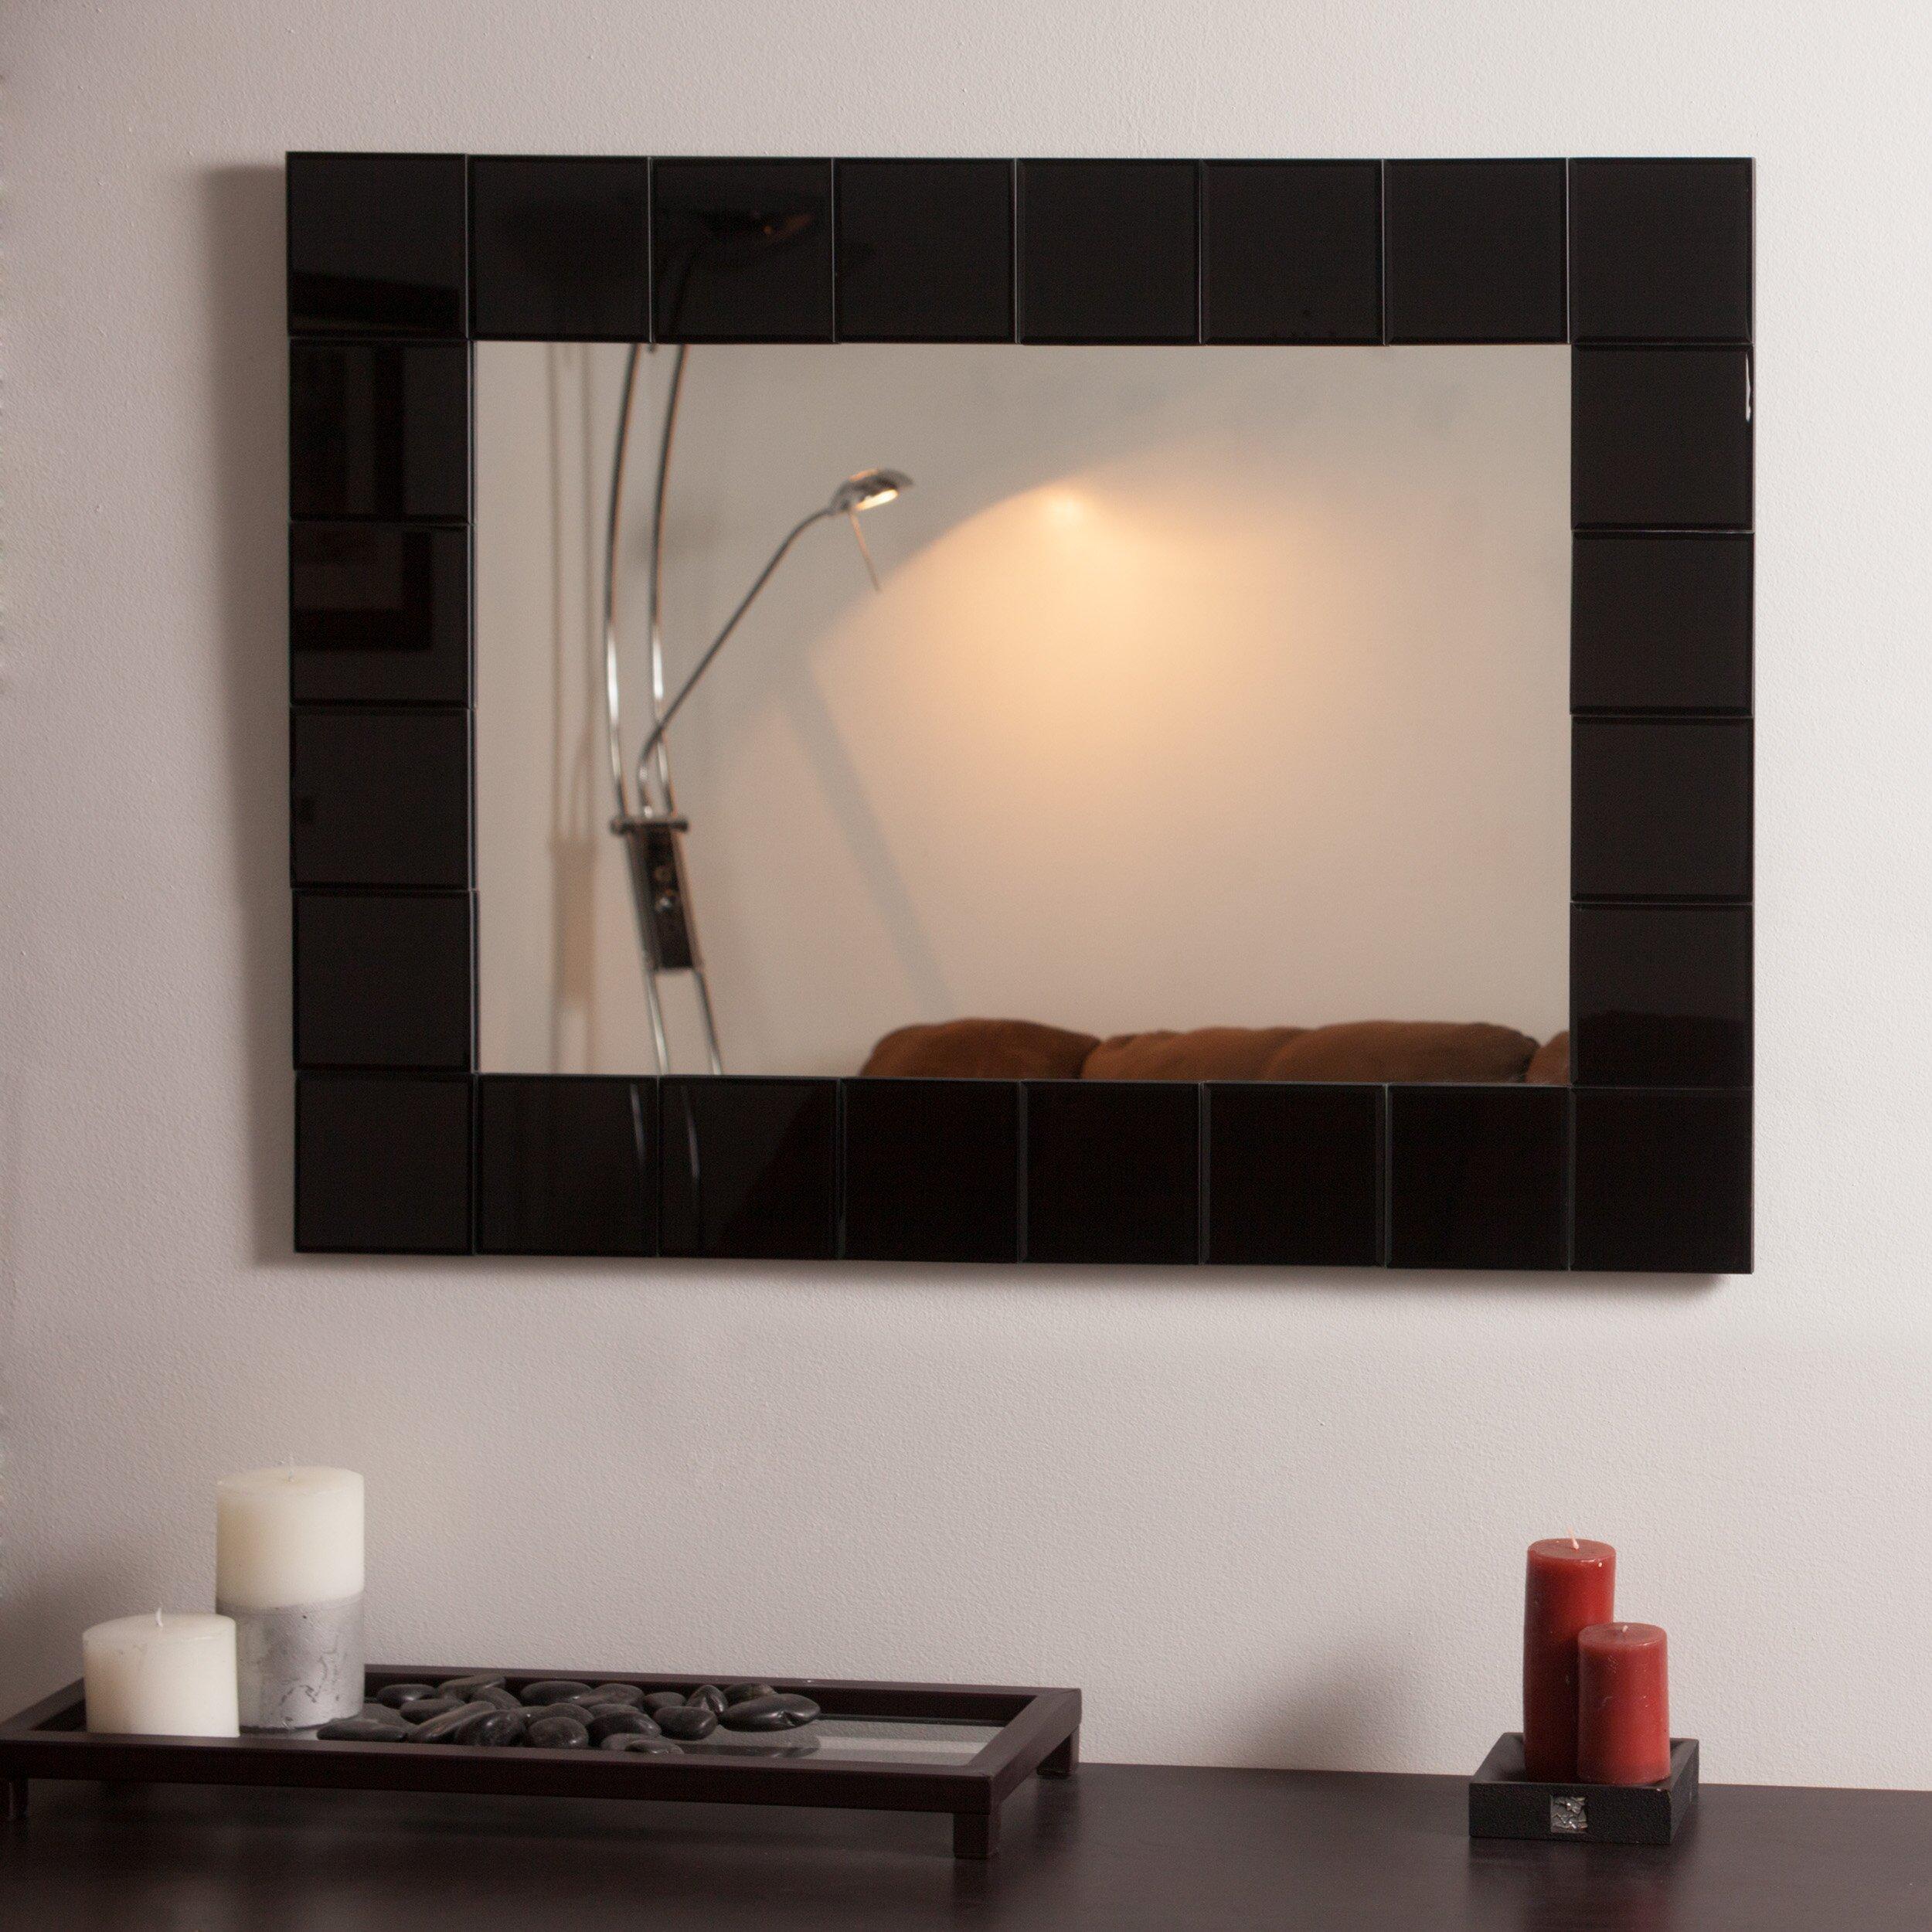 Decor wonderland montreal modern wall mirror reviews for Modern wall mirror